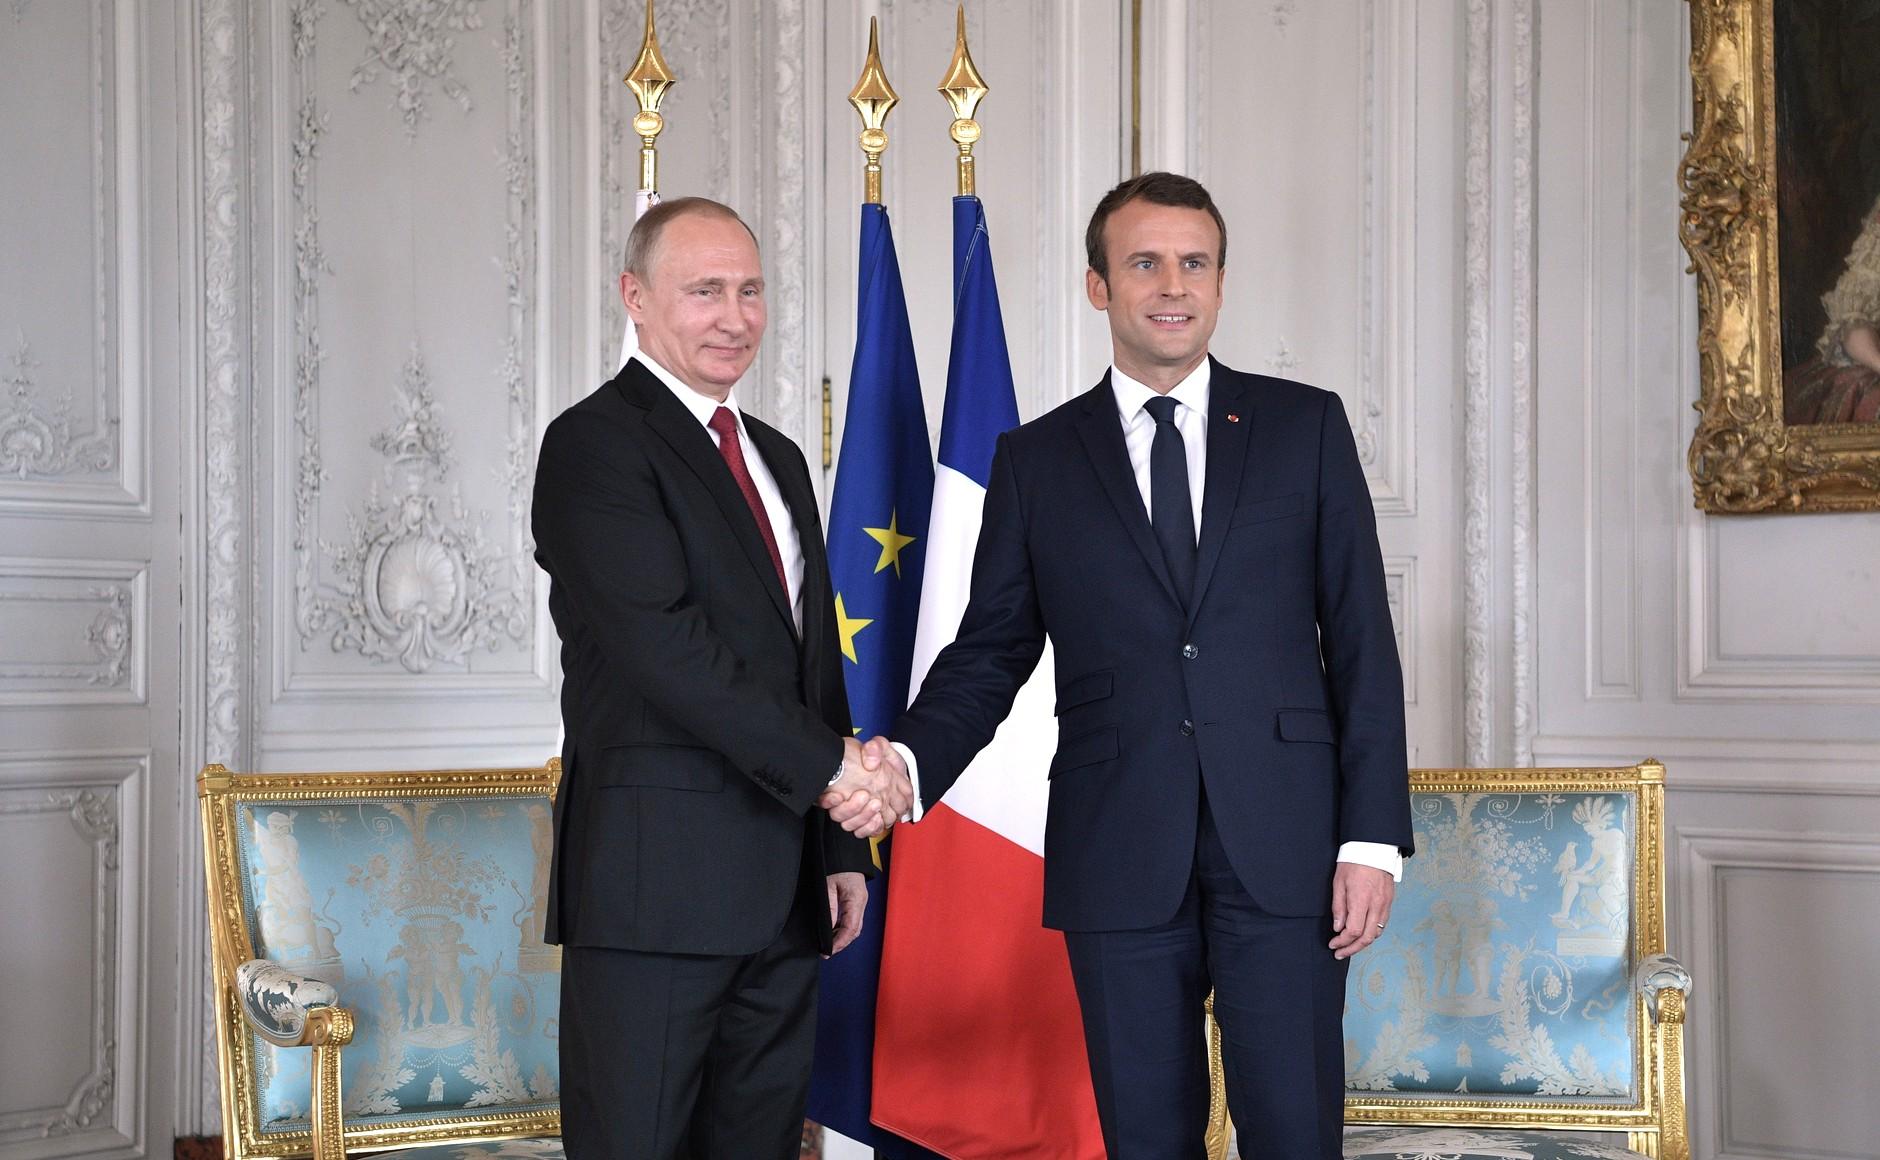 File:Vladimir Putin and Emmanuel Macron (2017-05-29) 04.jpg - Wikimedia Commons